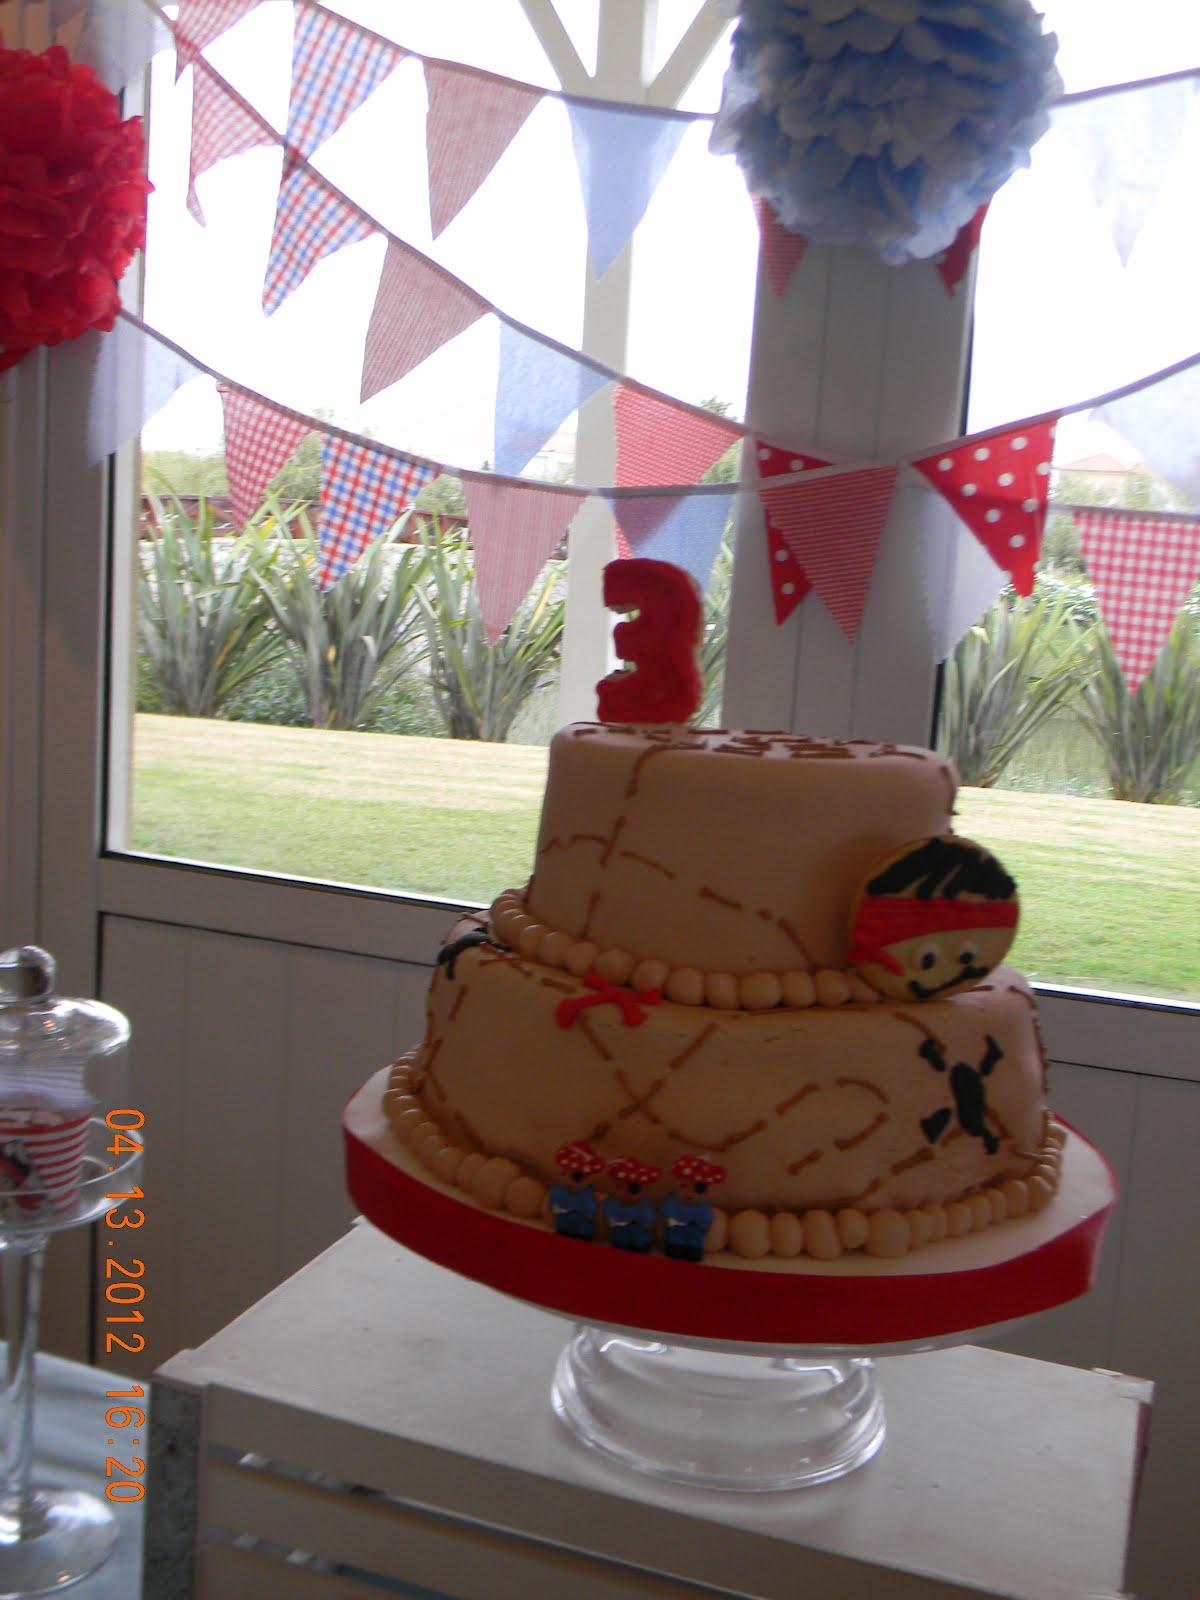 Cake De Jake El Pirata